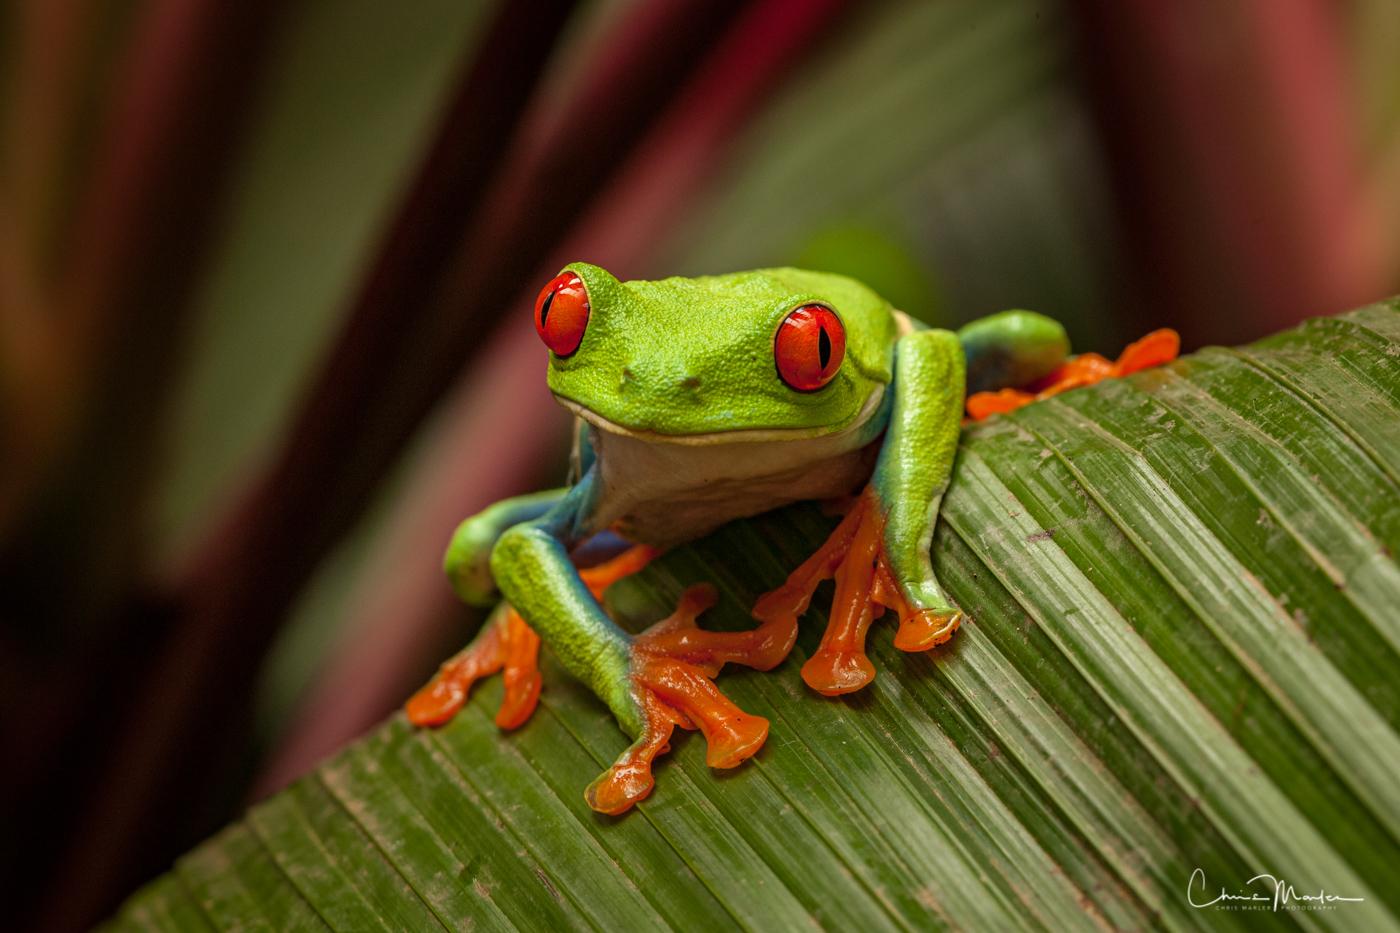 Costa Rica, La Paz, Red eyed Tree Frog, amphibian, humor, photo